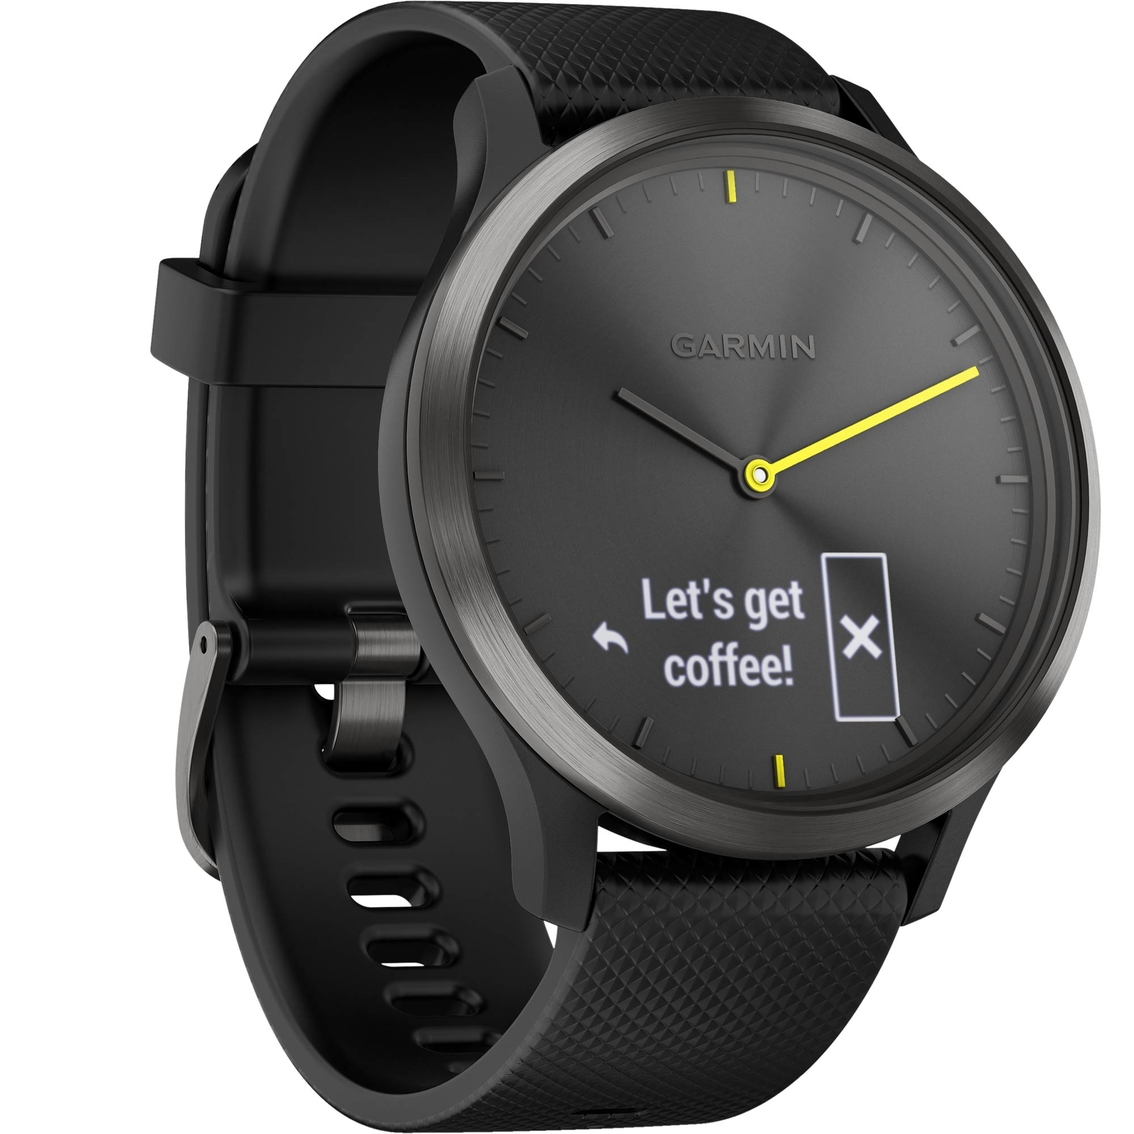 fad1f1fba48fbc Garmin Vivomove Hr Sport Hybrid Smartwatch